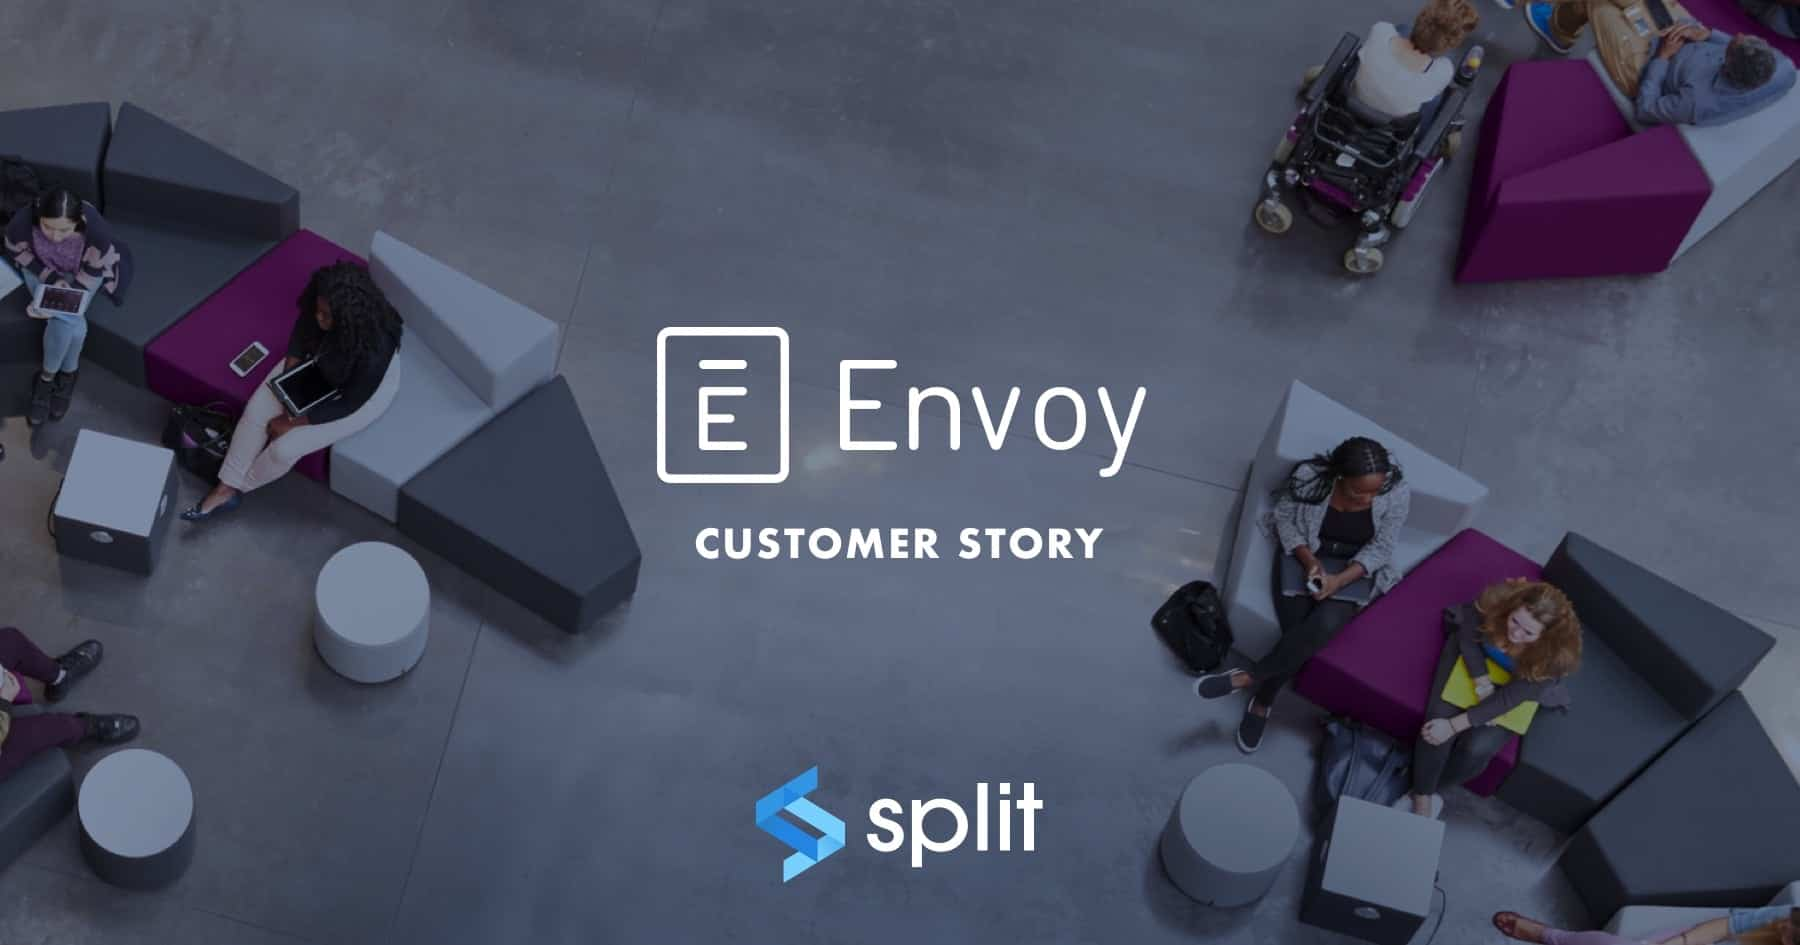 envoy-social-image